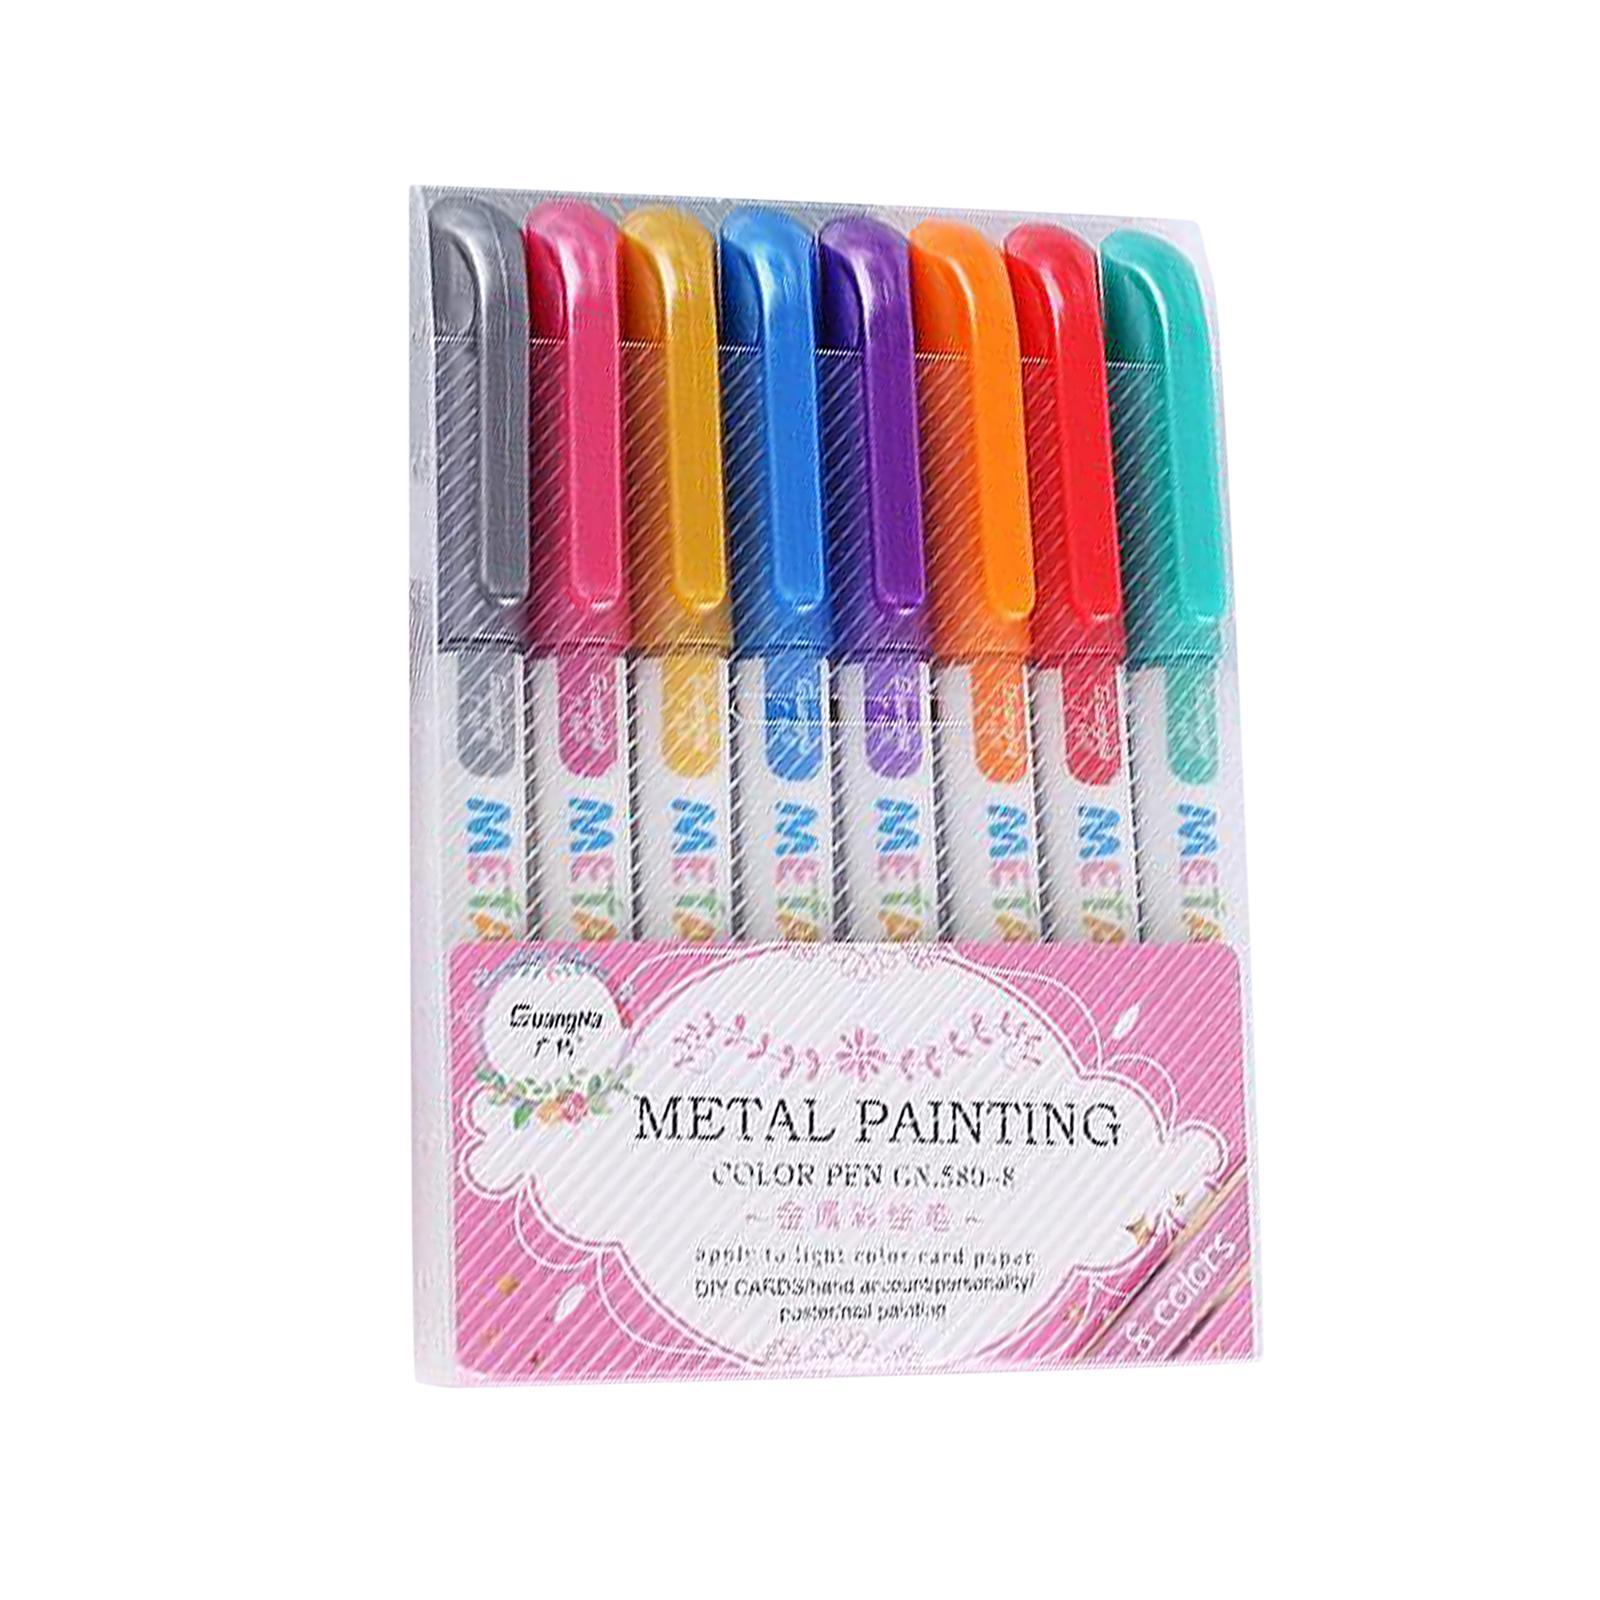 miniatura 4 - 8-12-20x-Permanente-Metallic-Marcatori-Vernici-Penne-per-Adulti-Colouring